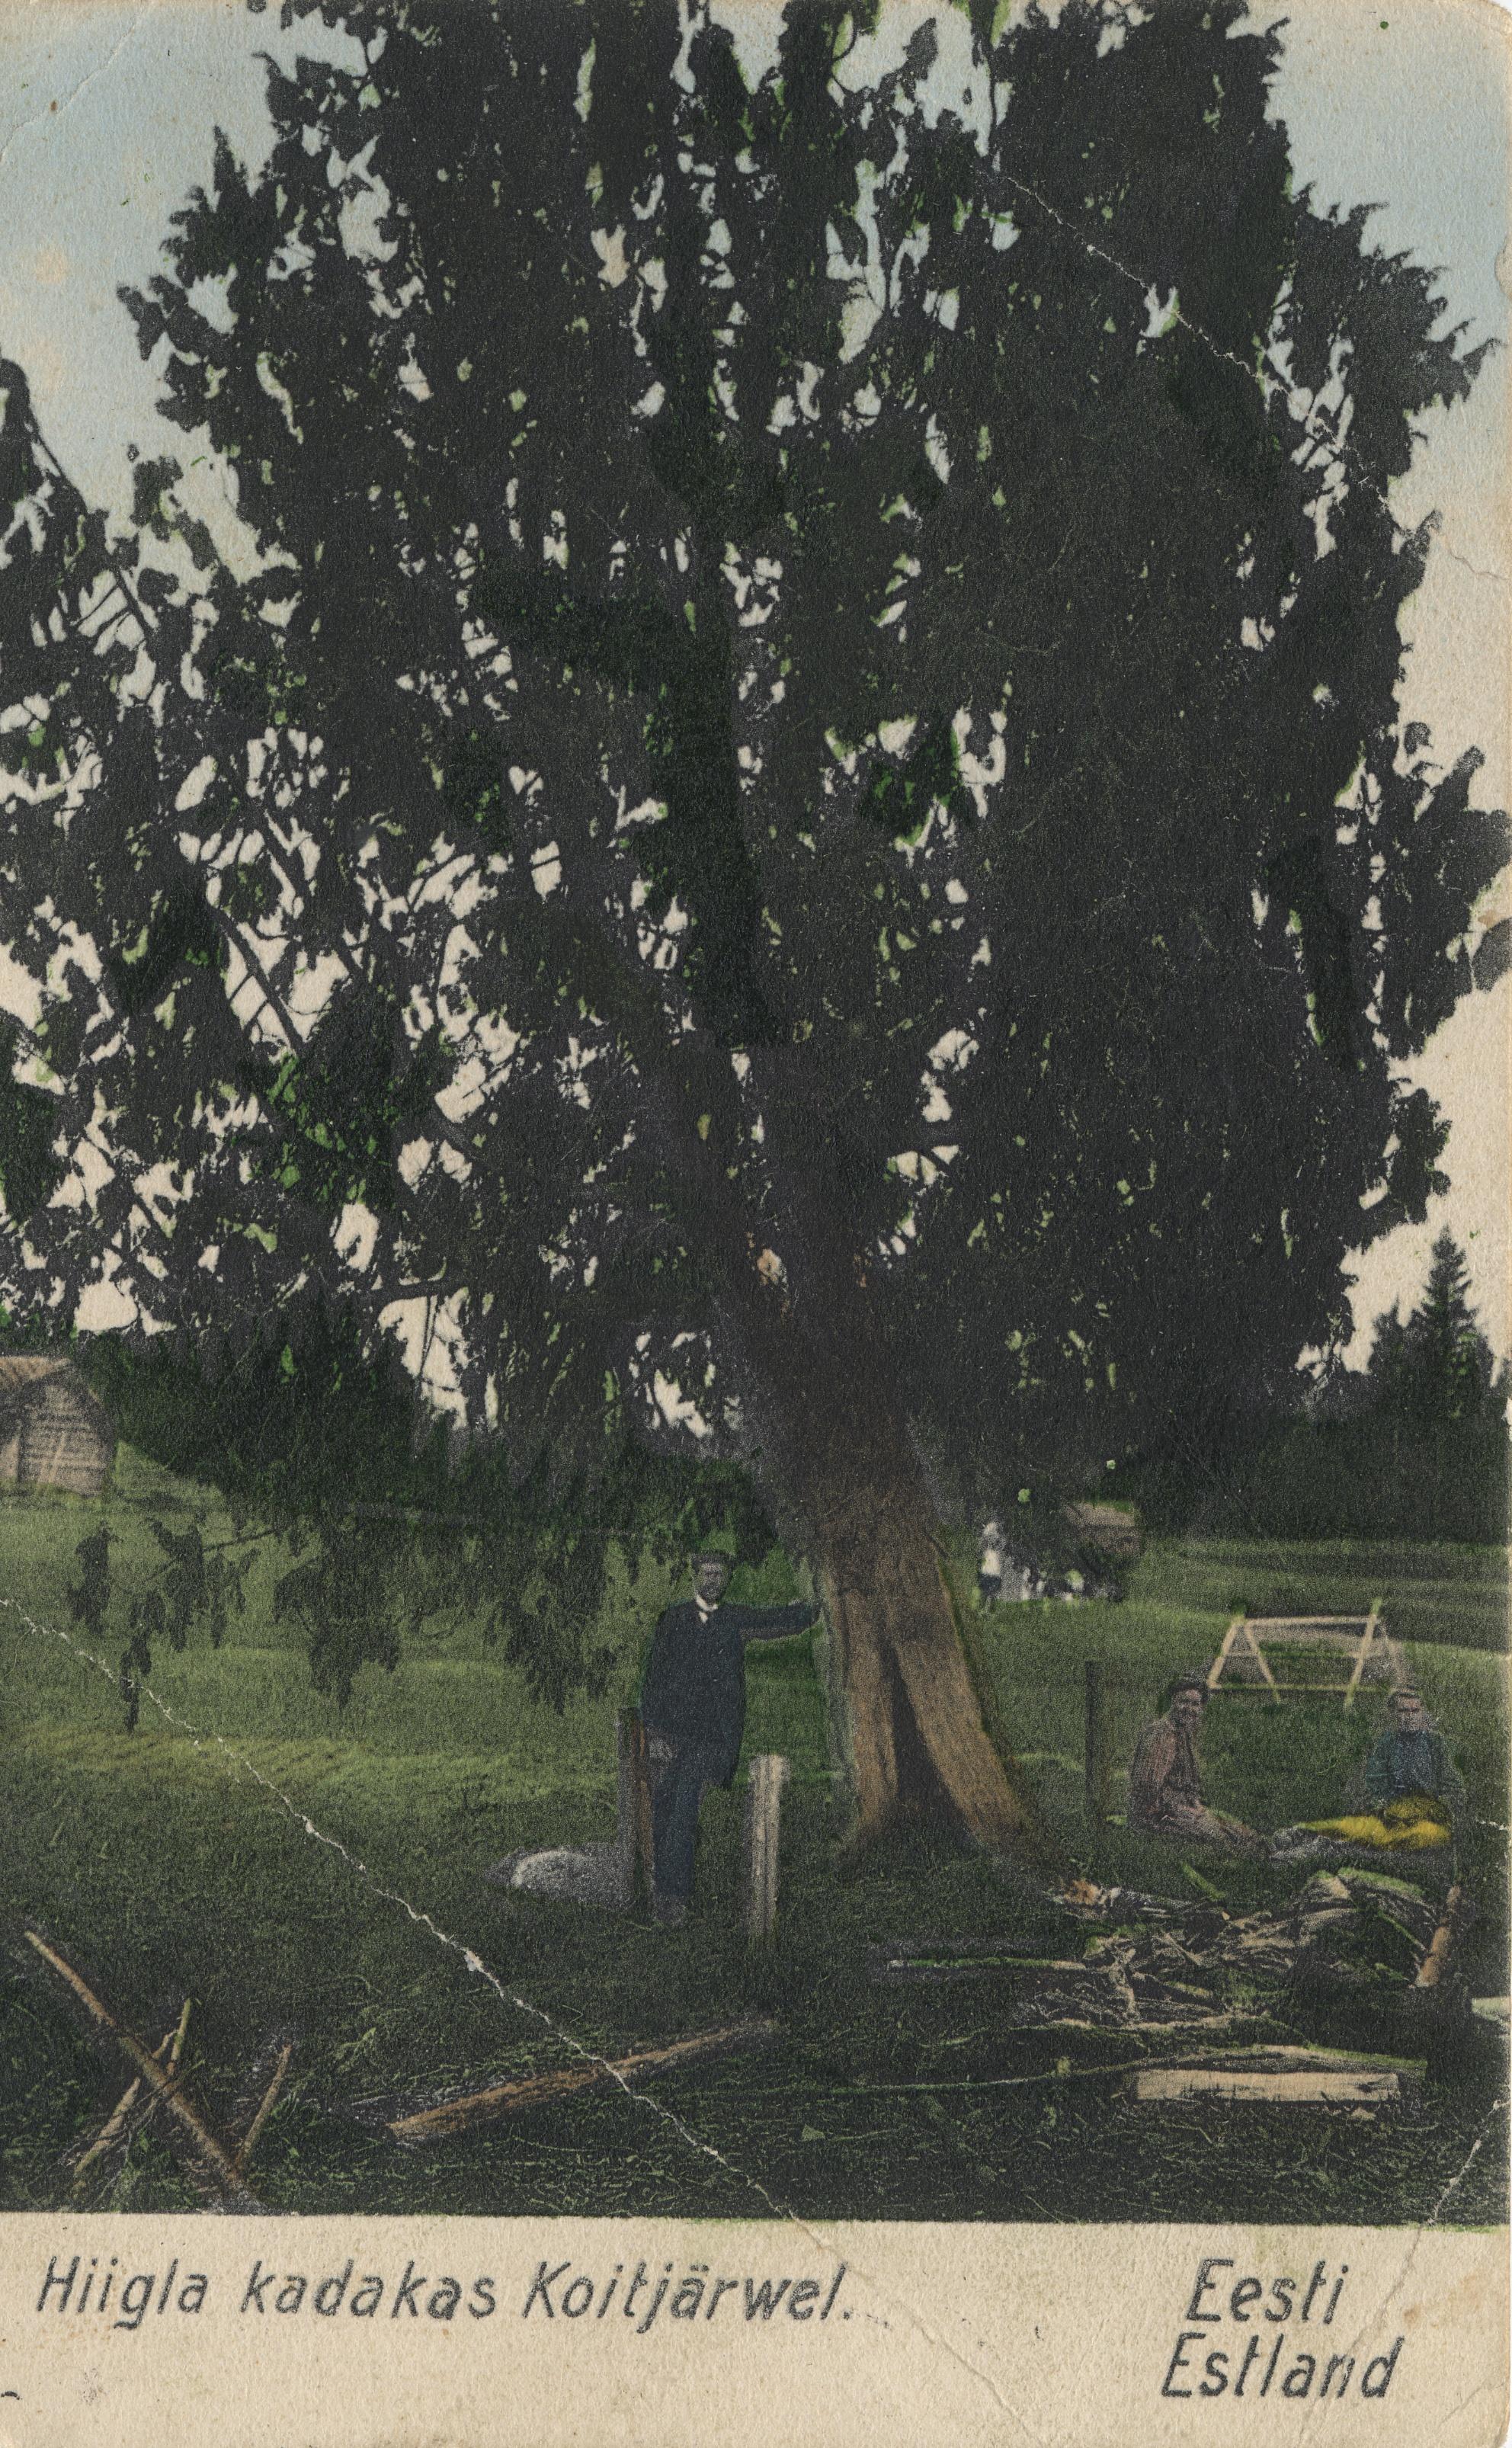 Окрестности Ревеля. Койтъярве (1)